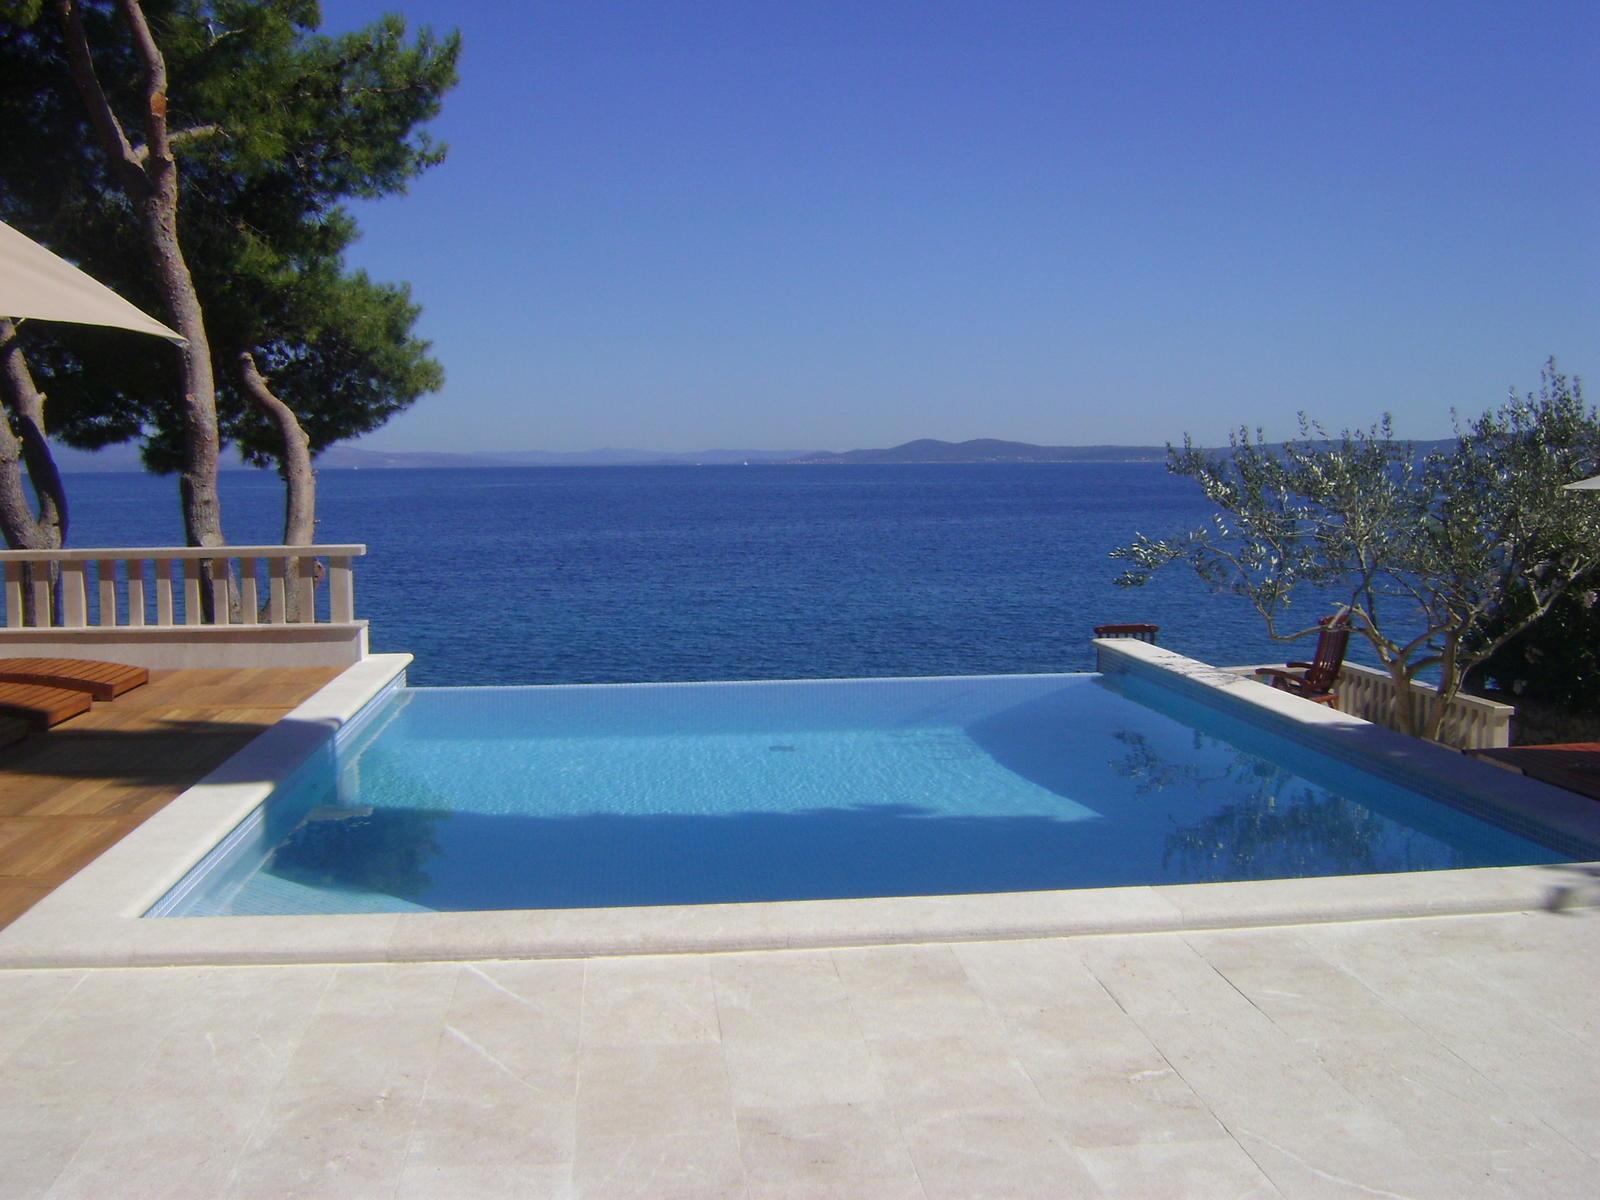 Villa Dream Trogir view across the pool towards the sea